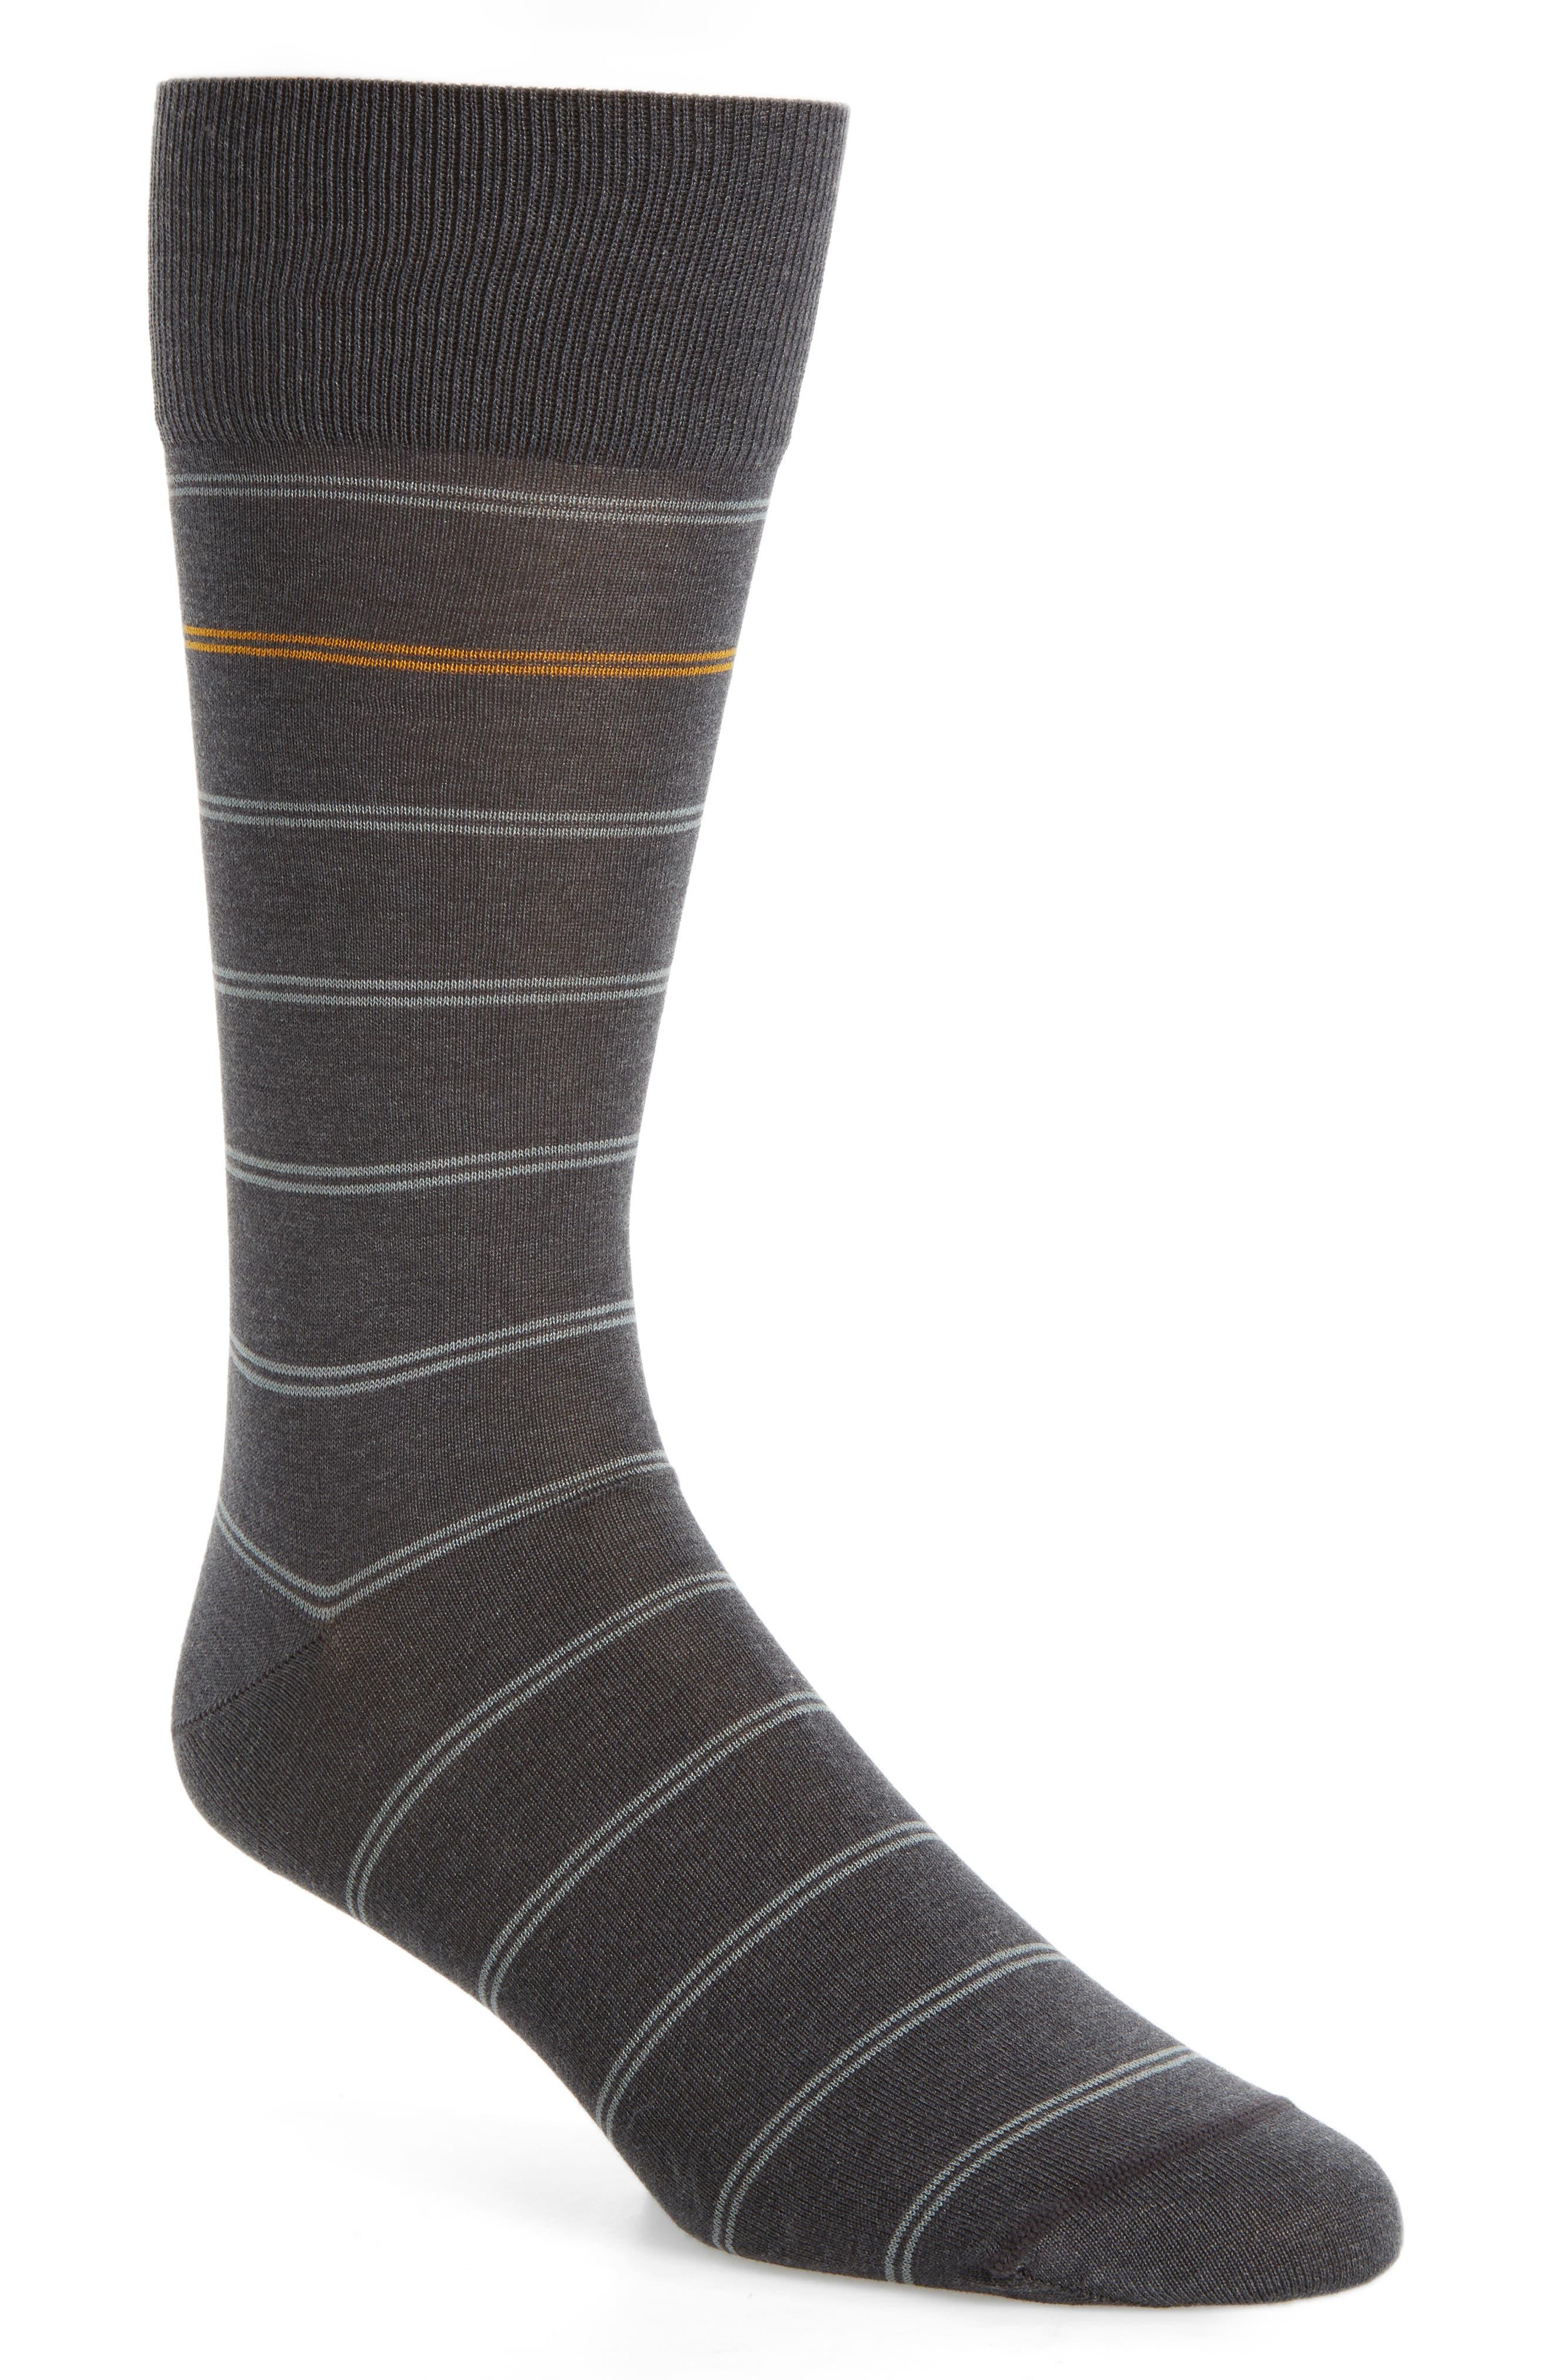 Stripe Socks,                         Main,                         color, Charcoal/ Grey